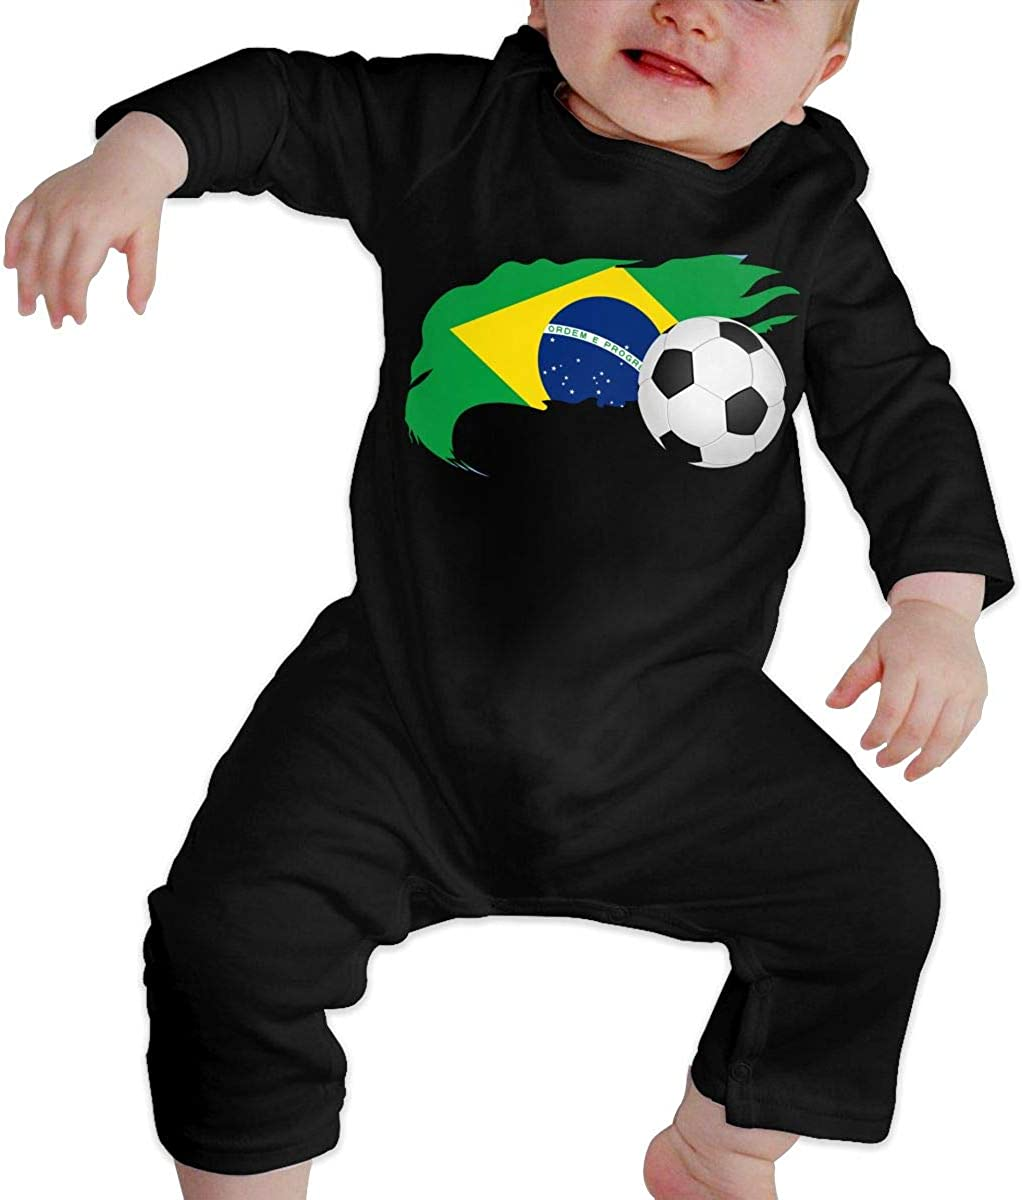 Soccer Ball with Brazil Flag Printed Newborn Infant Baby Boy Girl Bodysuit Long Sleeve Rompers Black